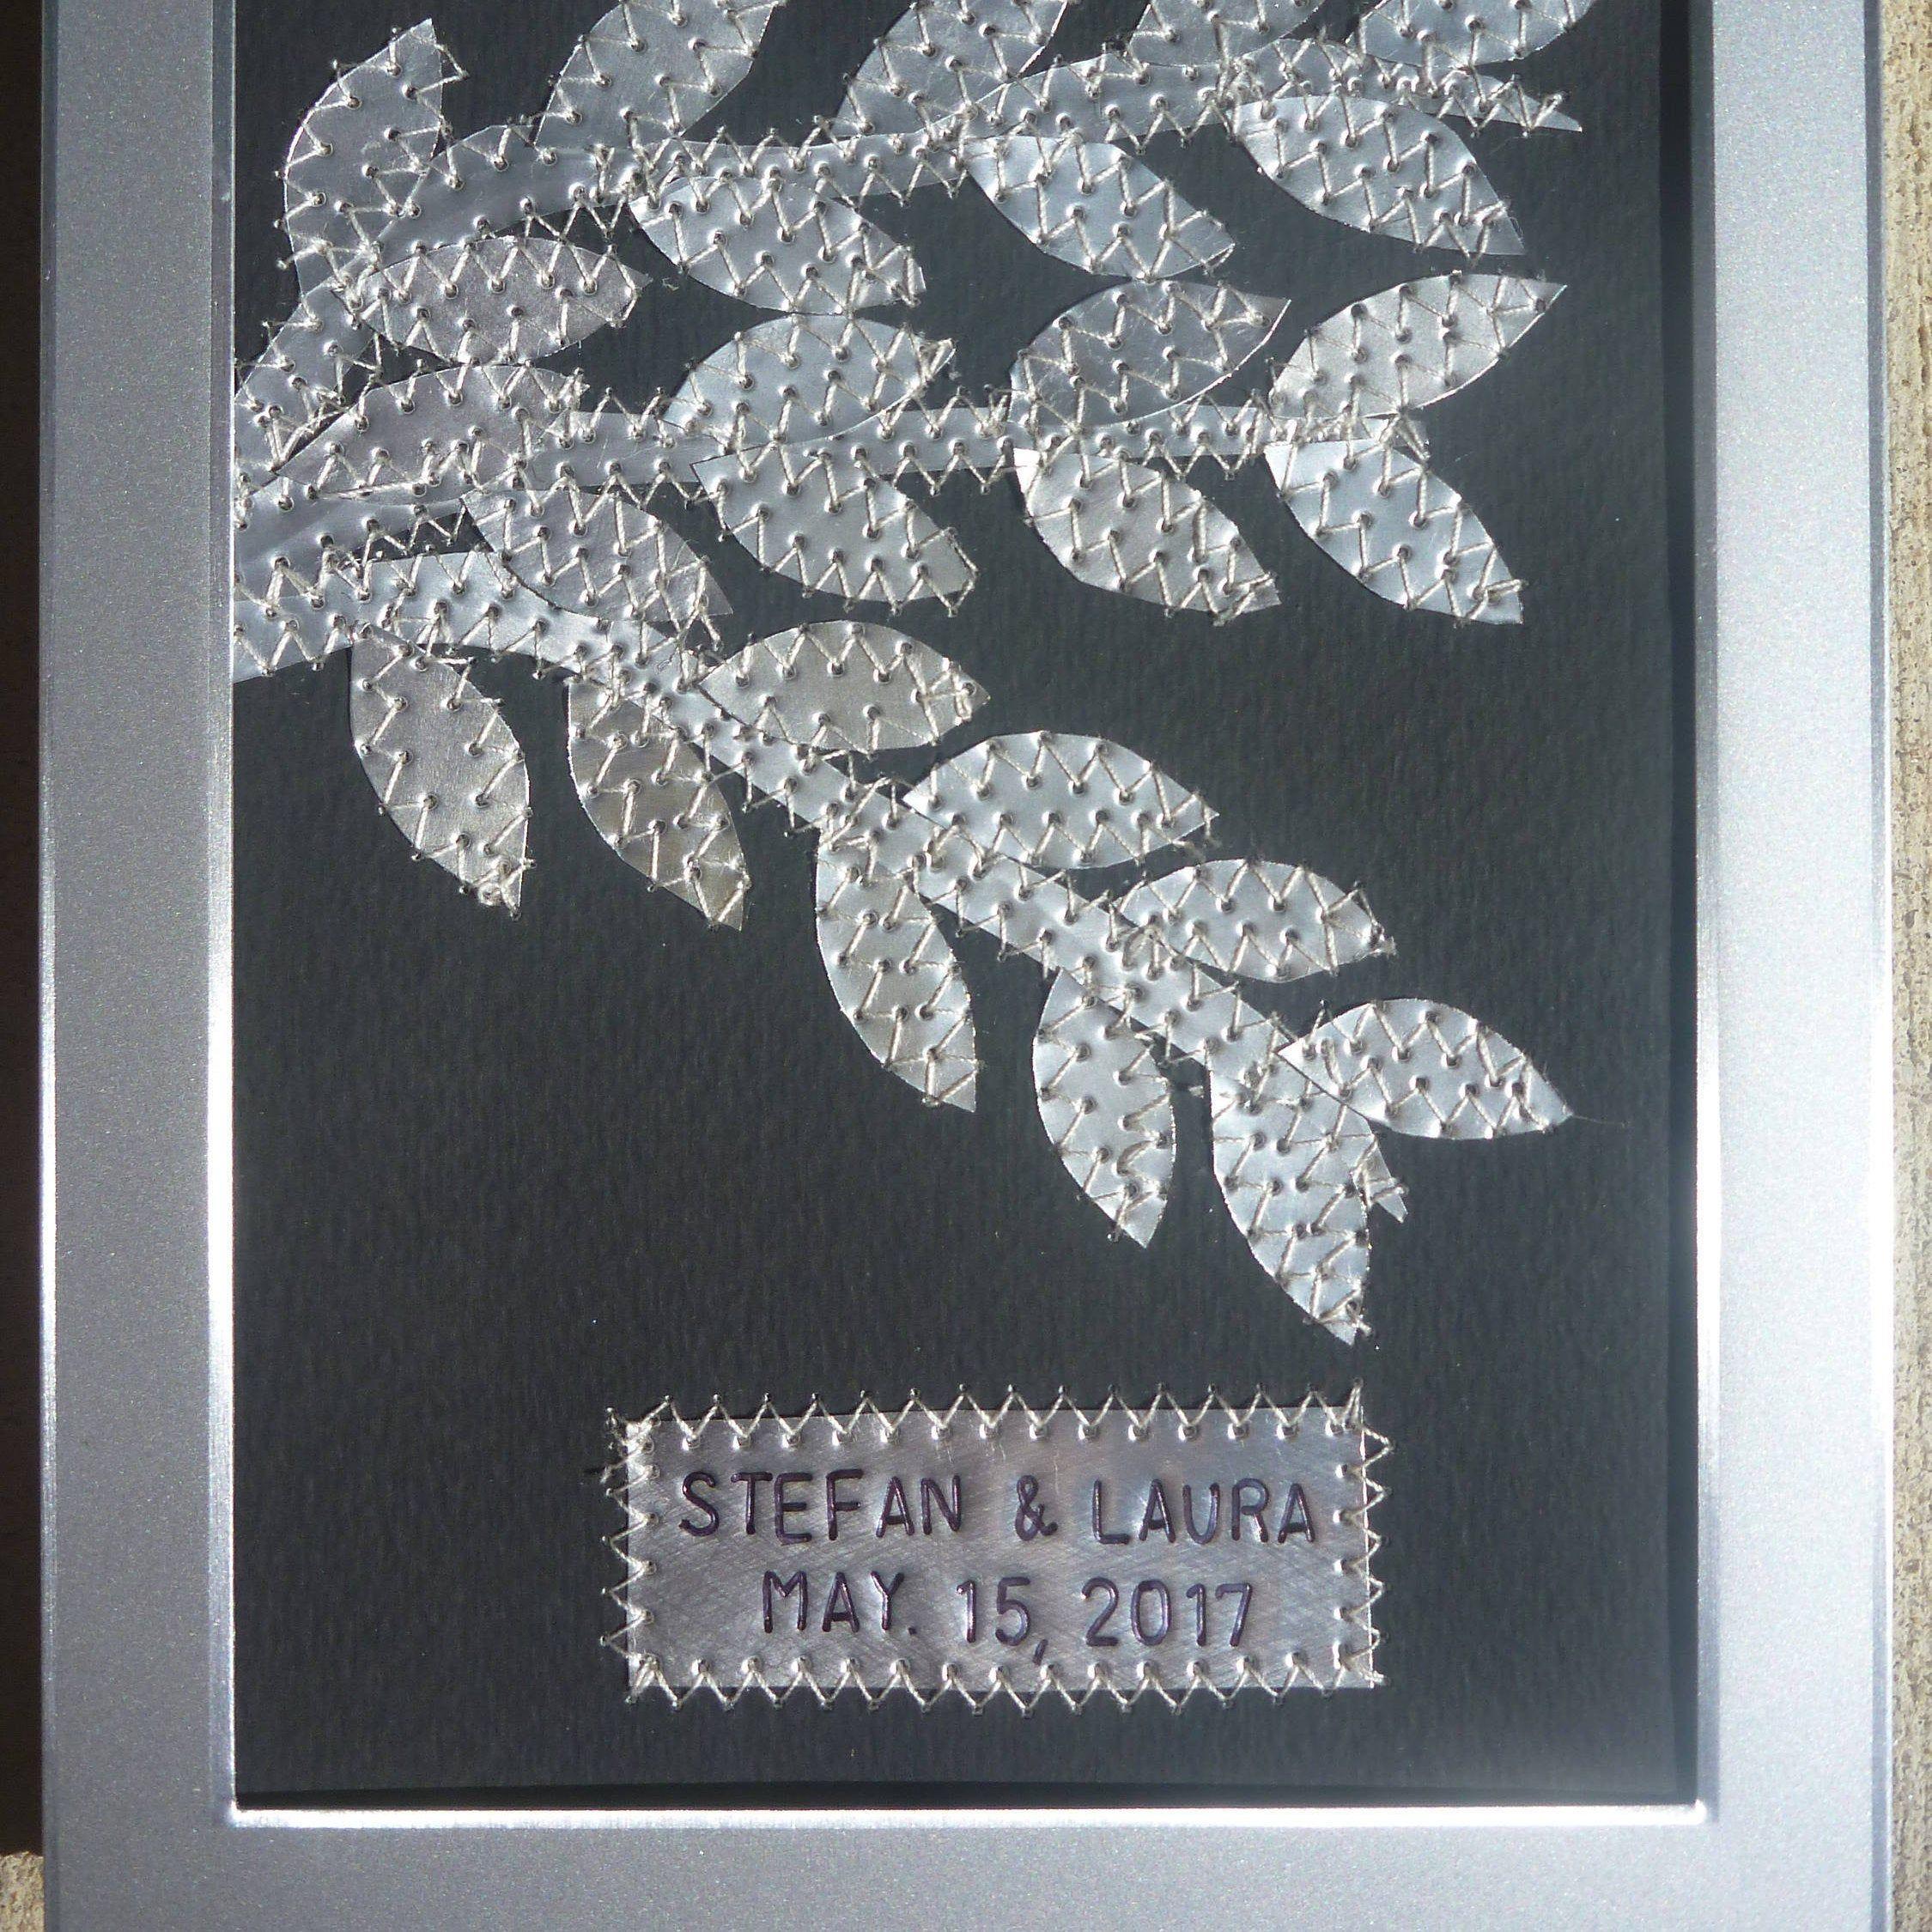 10 Year Wedding Anniversary, Personalized Gift, Customized